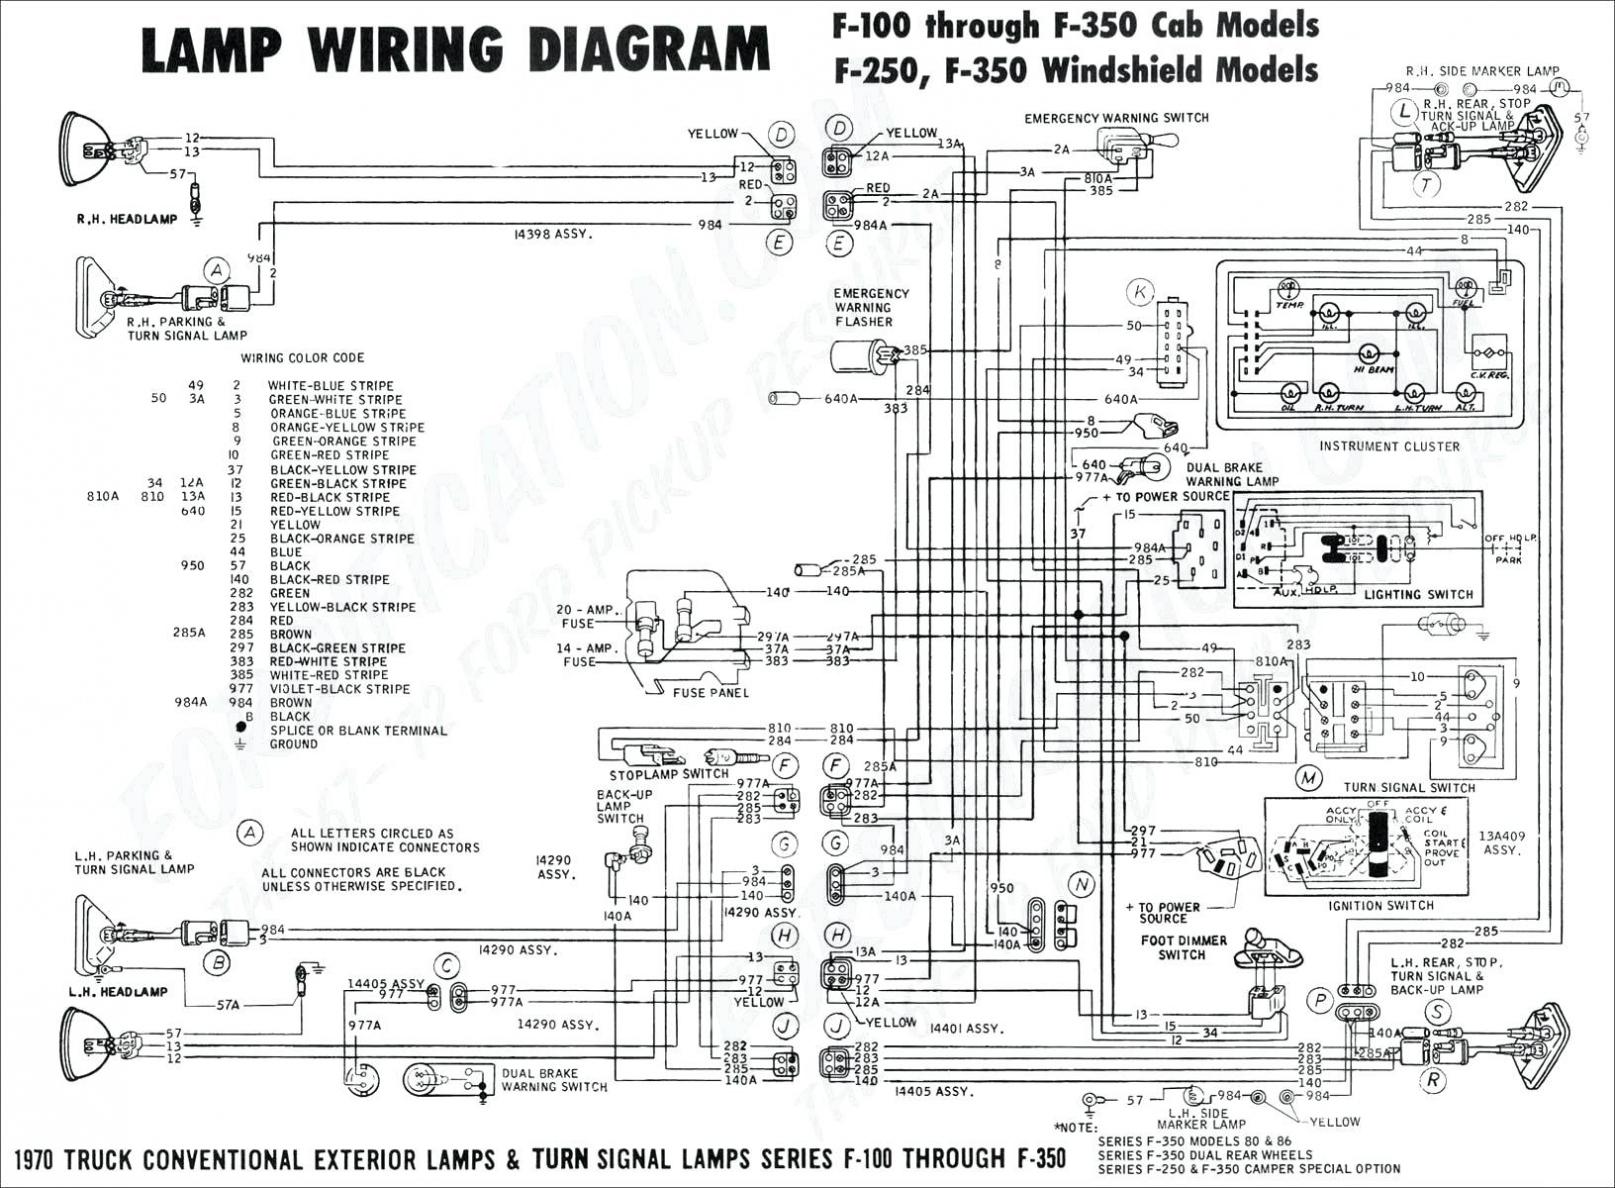 Mack Truck Wiring Diagrams Free | Wiring Diagram - Mack Truck Wiring Diagram Free Download